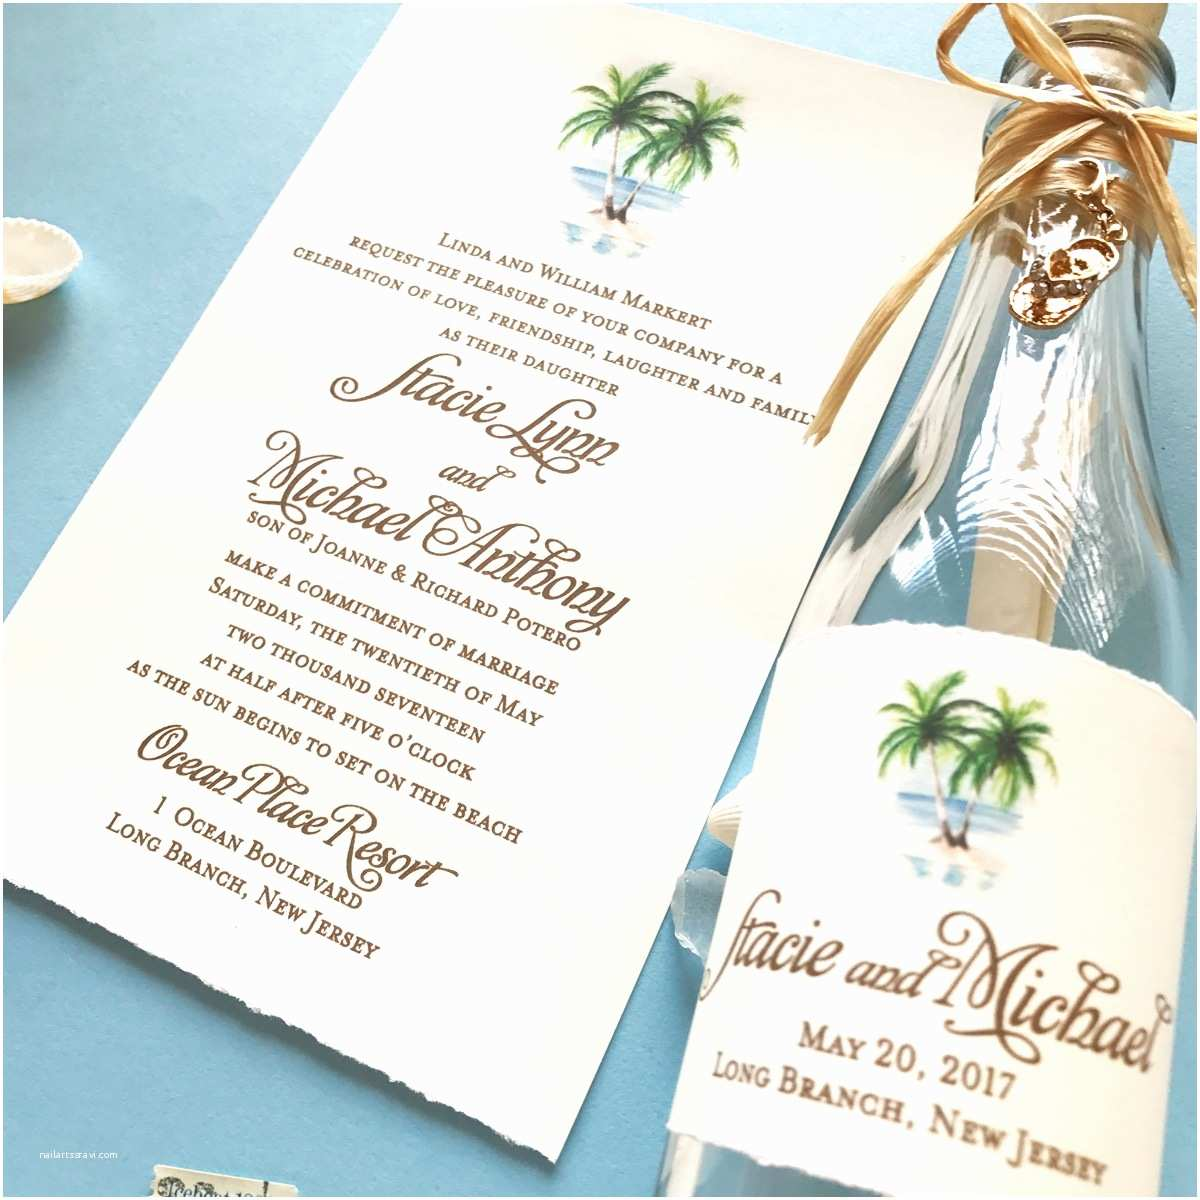 Wedding Invitations In A Bottle Stacie Beach Wedding Invitation In A Bottle